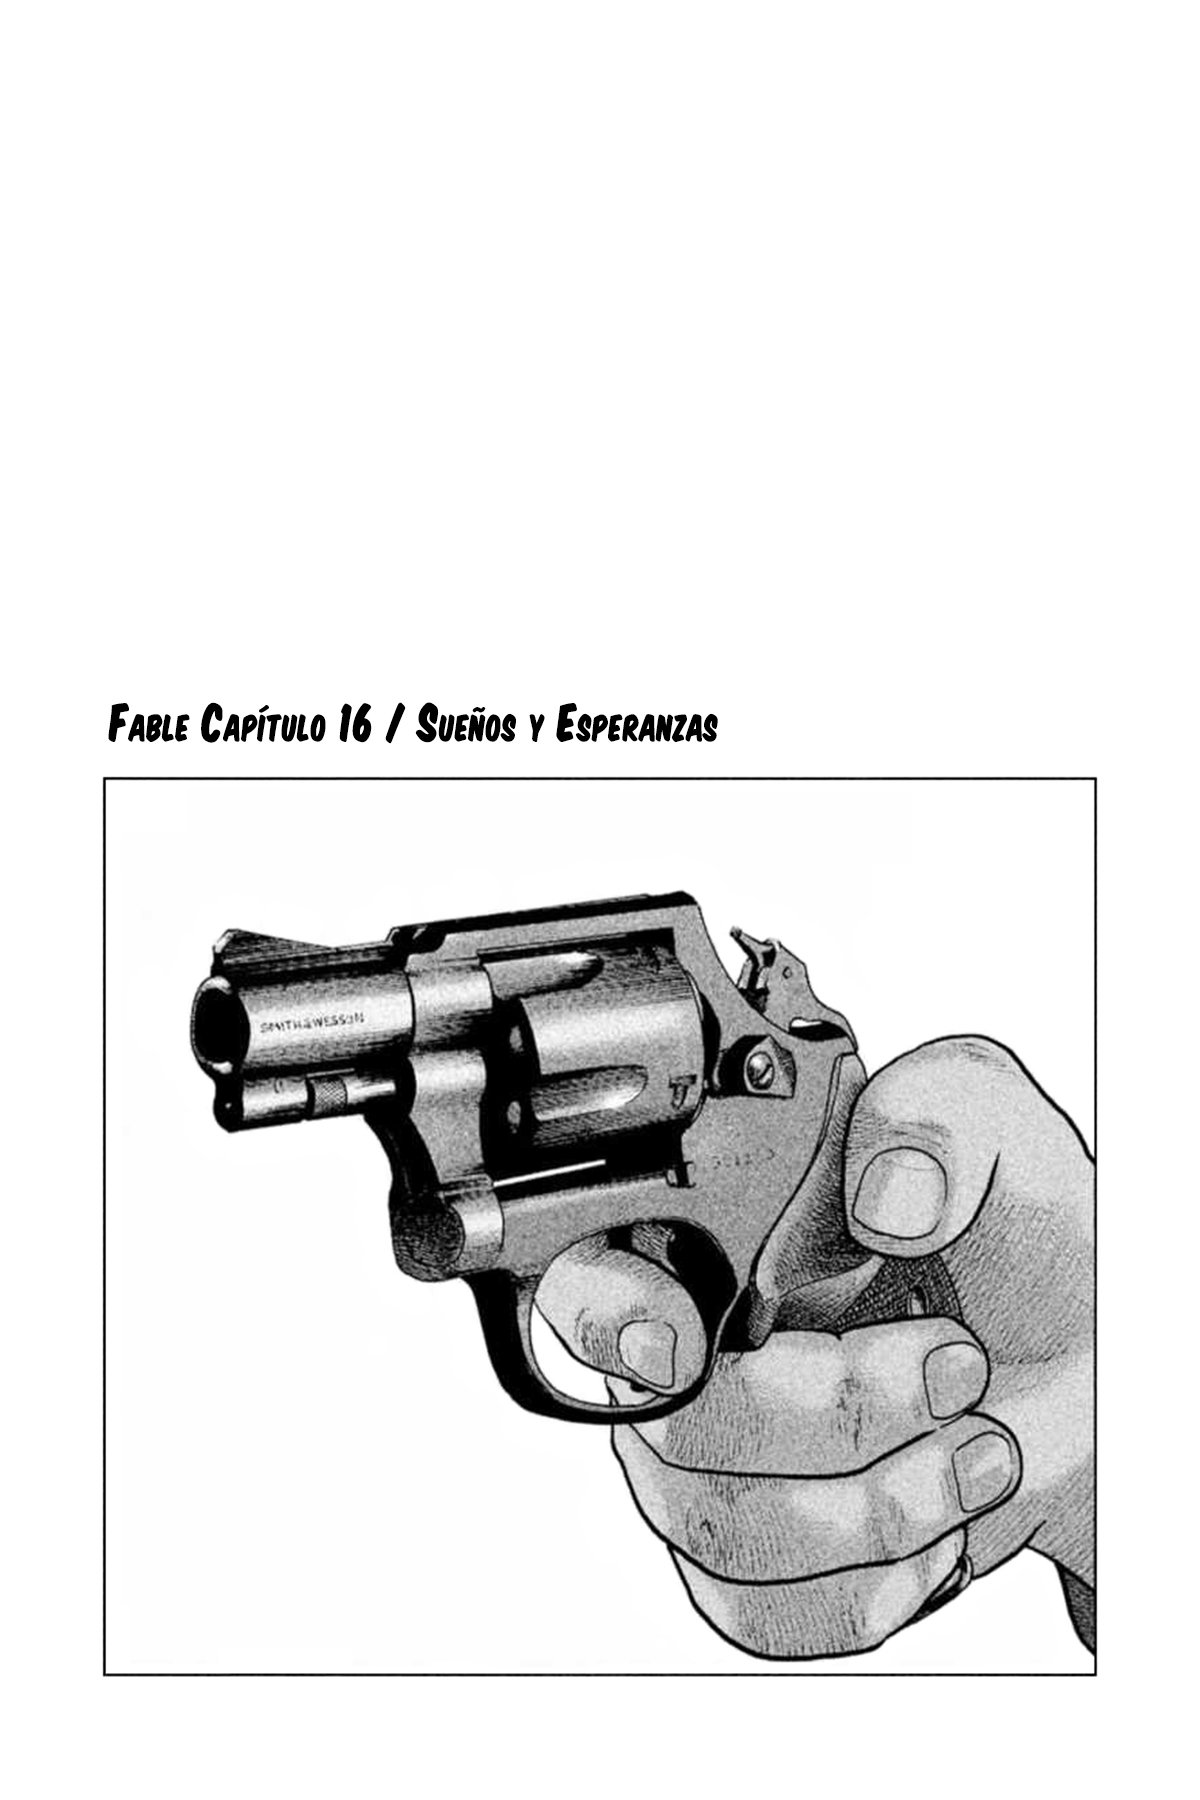 https://nine.mangadogs.com/es_manga/pic8/53/34037/946247/589ed0f0b009f655512d52bece14827c.jpg Page 1